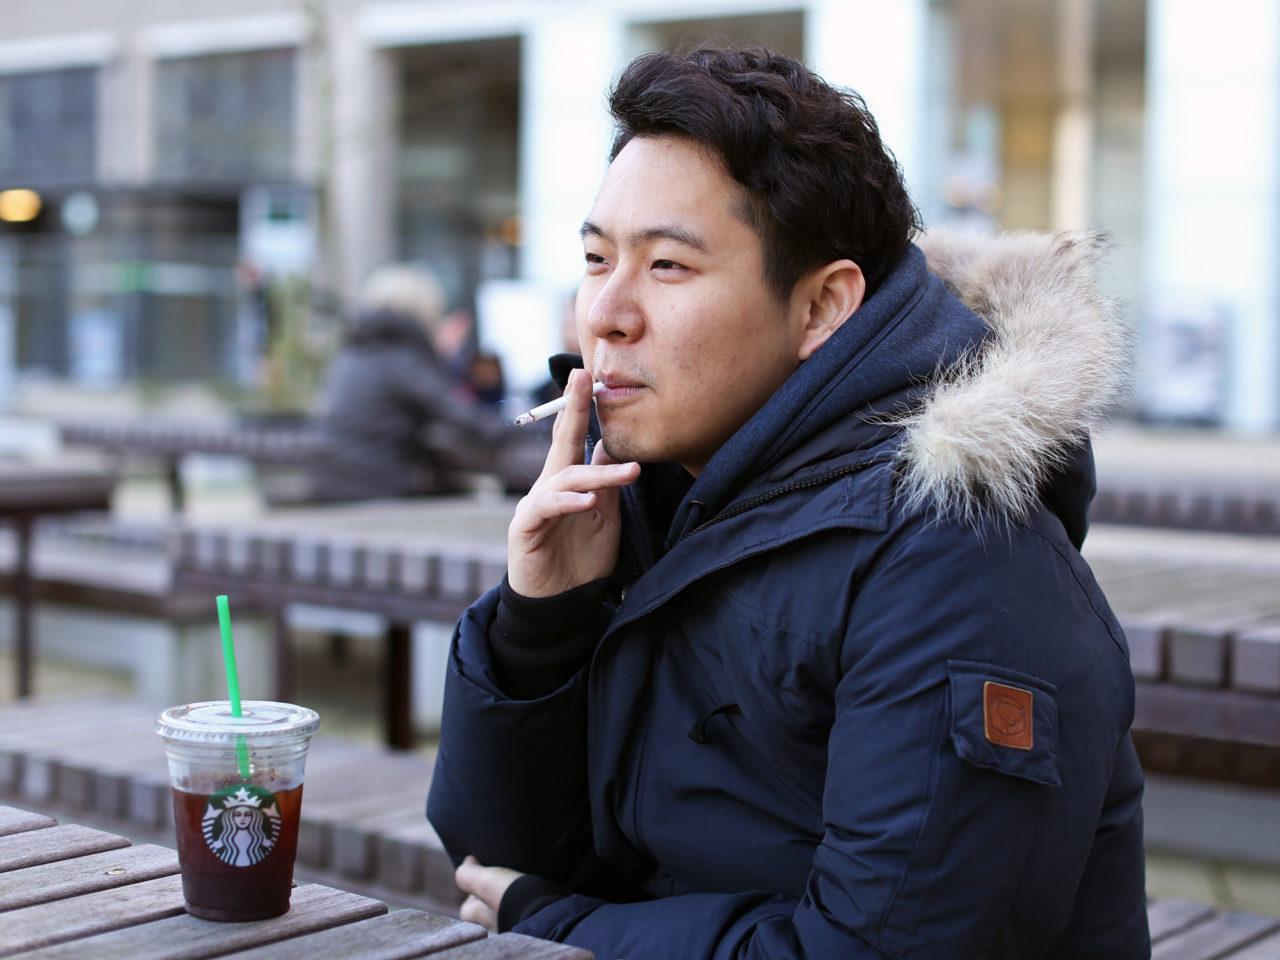 Rokers roken sigaretten rookplek Seunghwan Oh